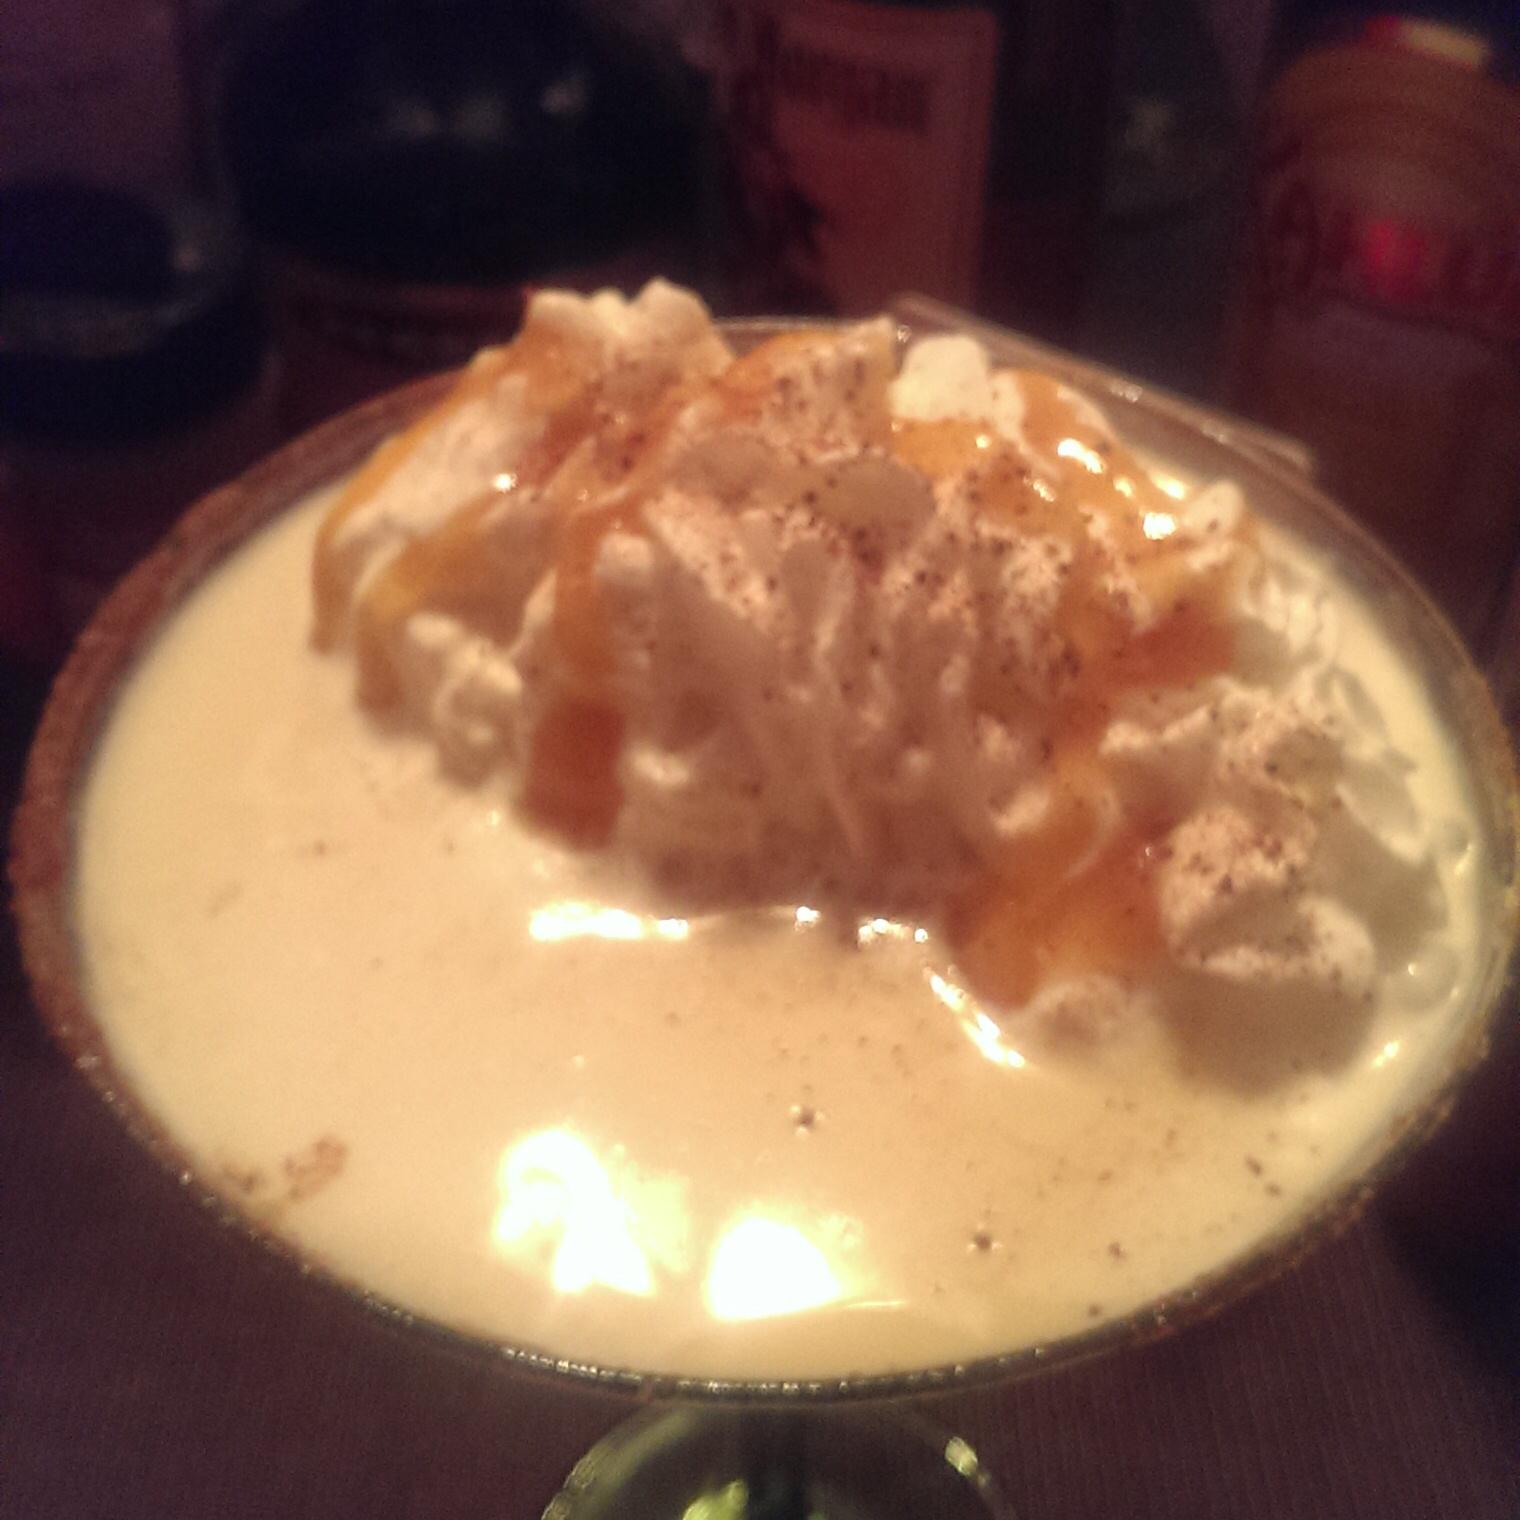 Pumpkin-Spiced Martini Donna S